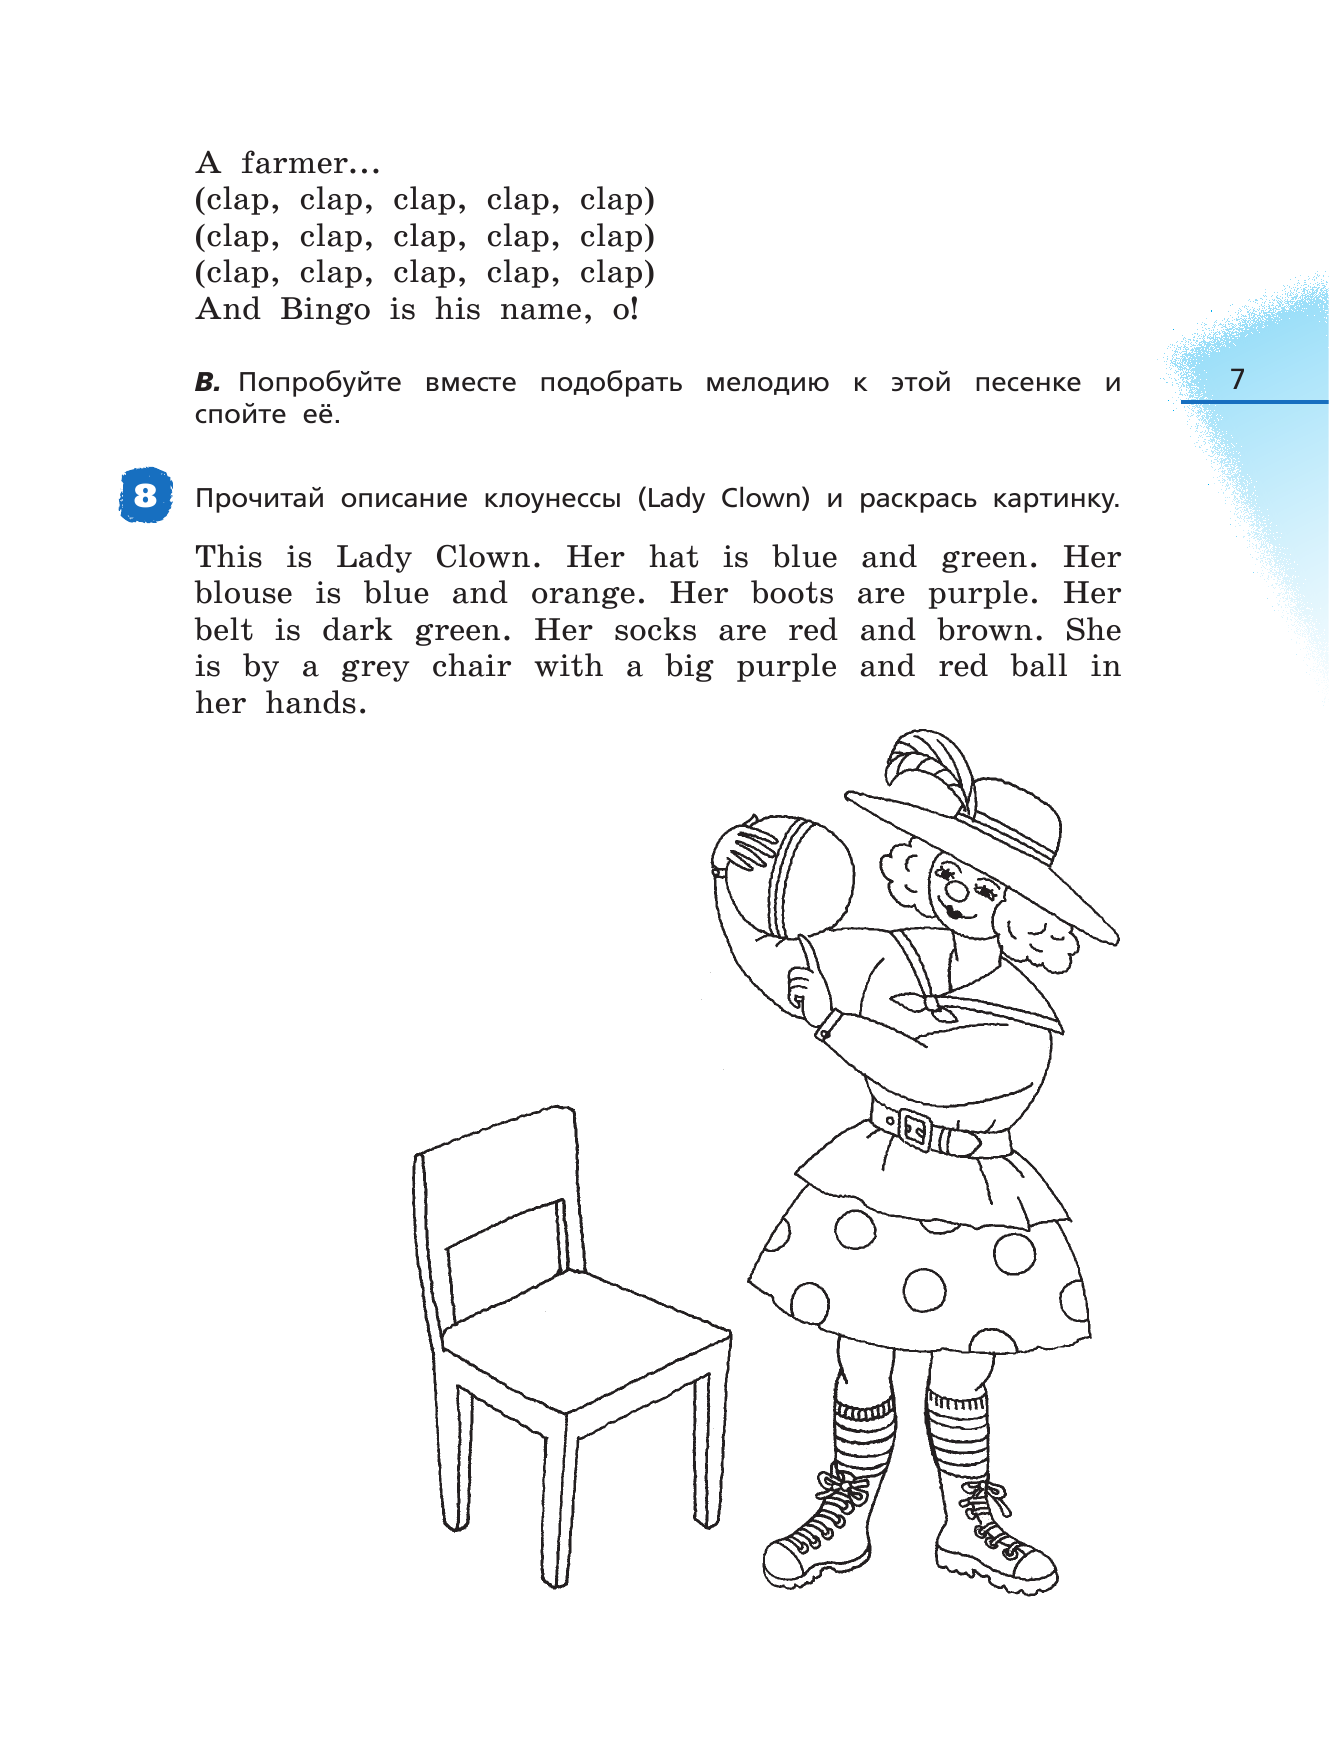 английский язык 4 класс страница 144